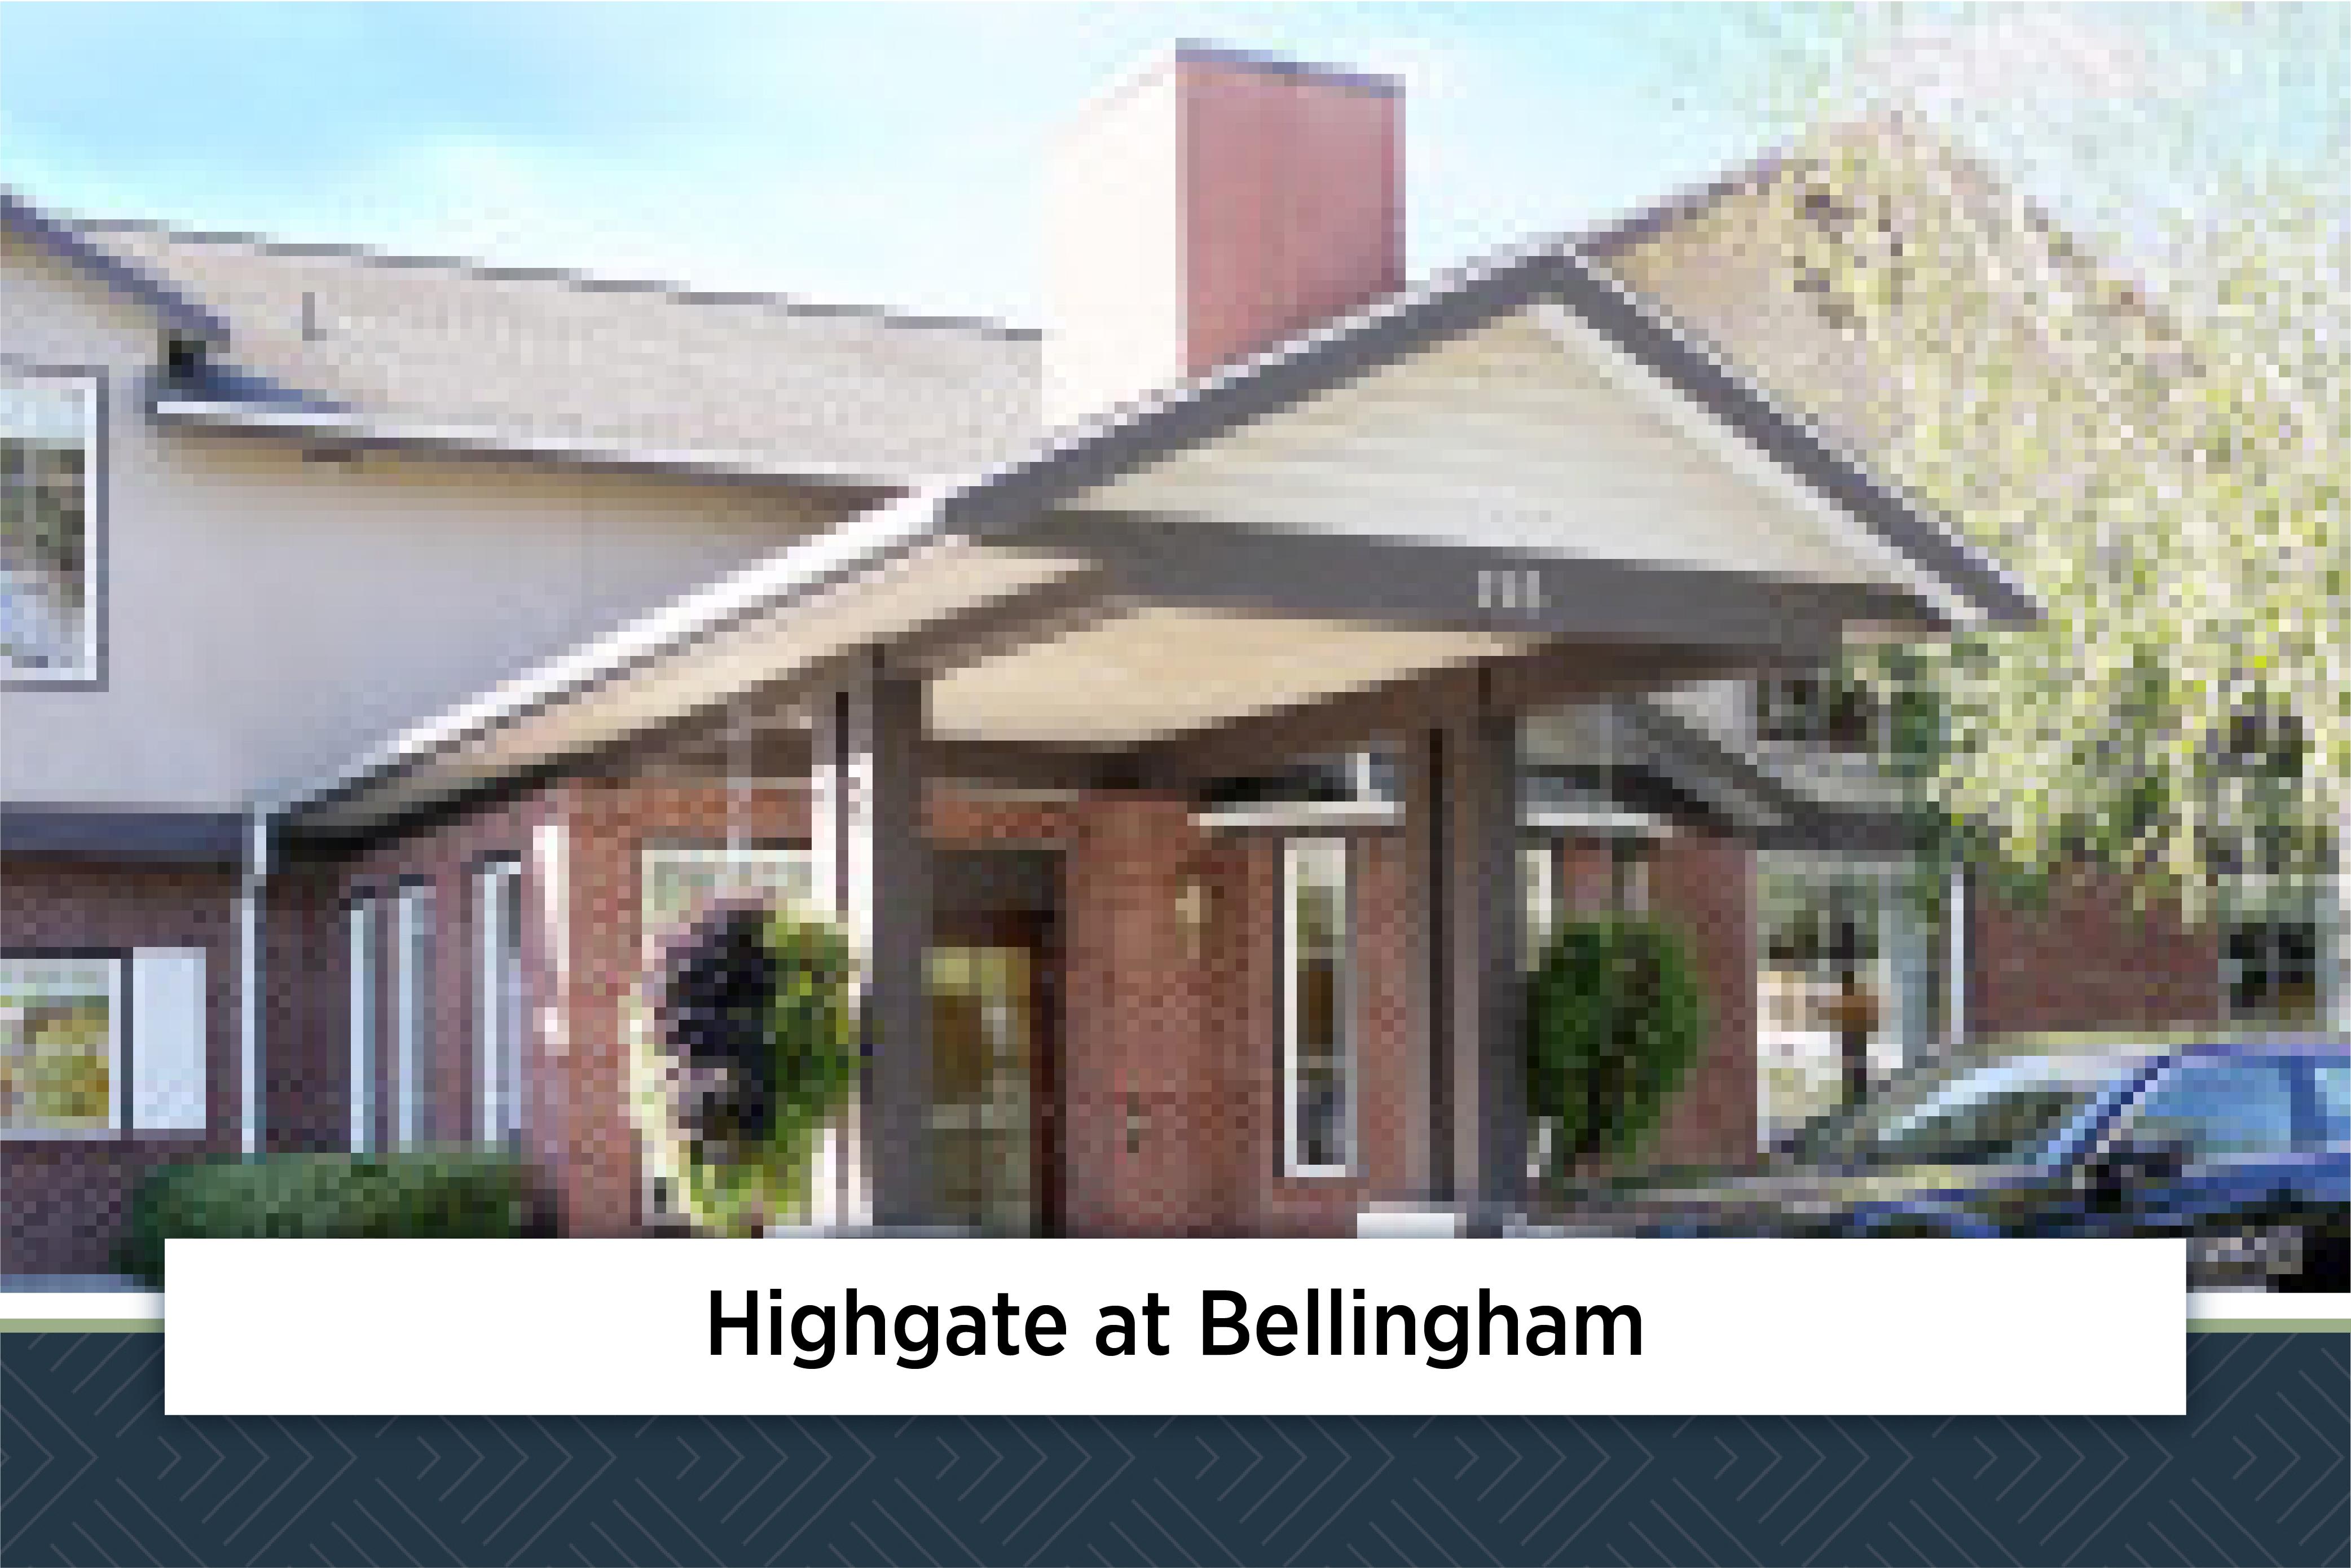 Highgate at Bellingham